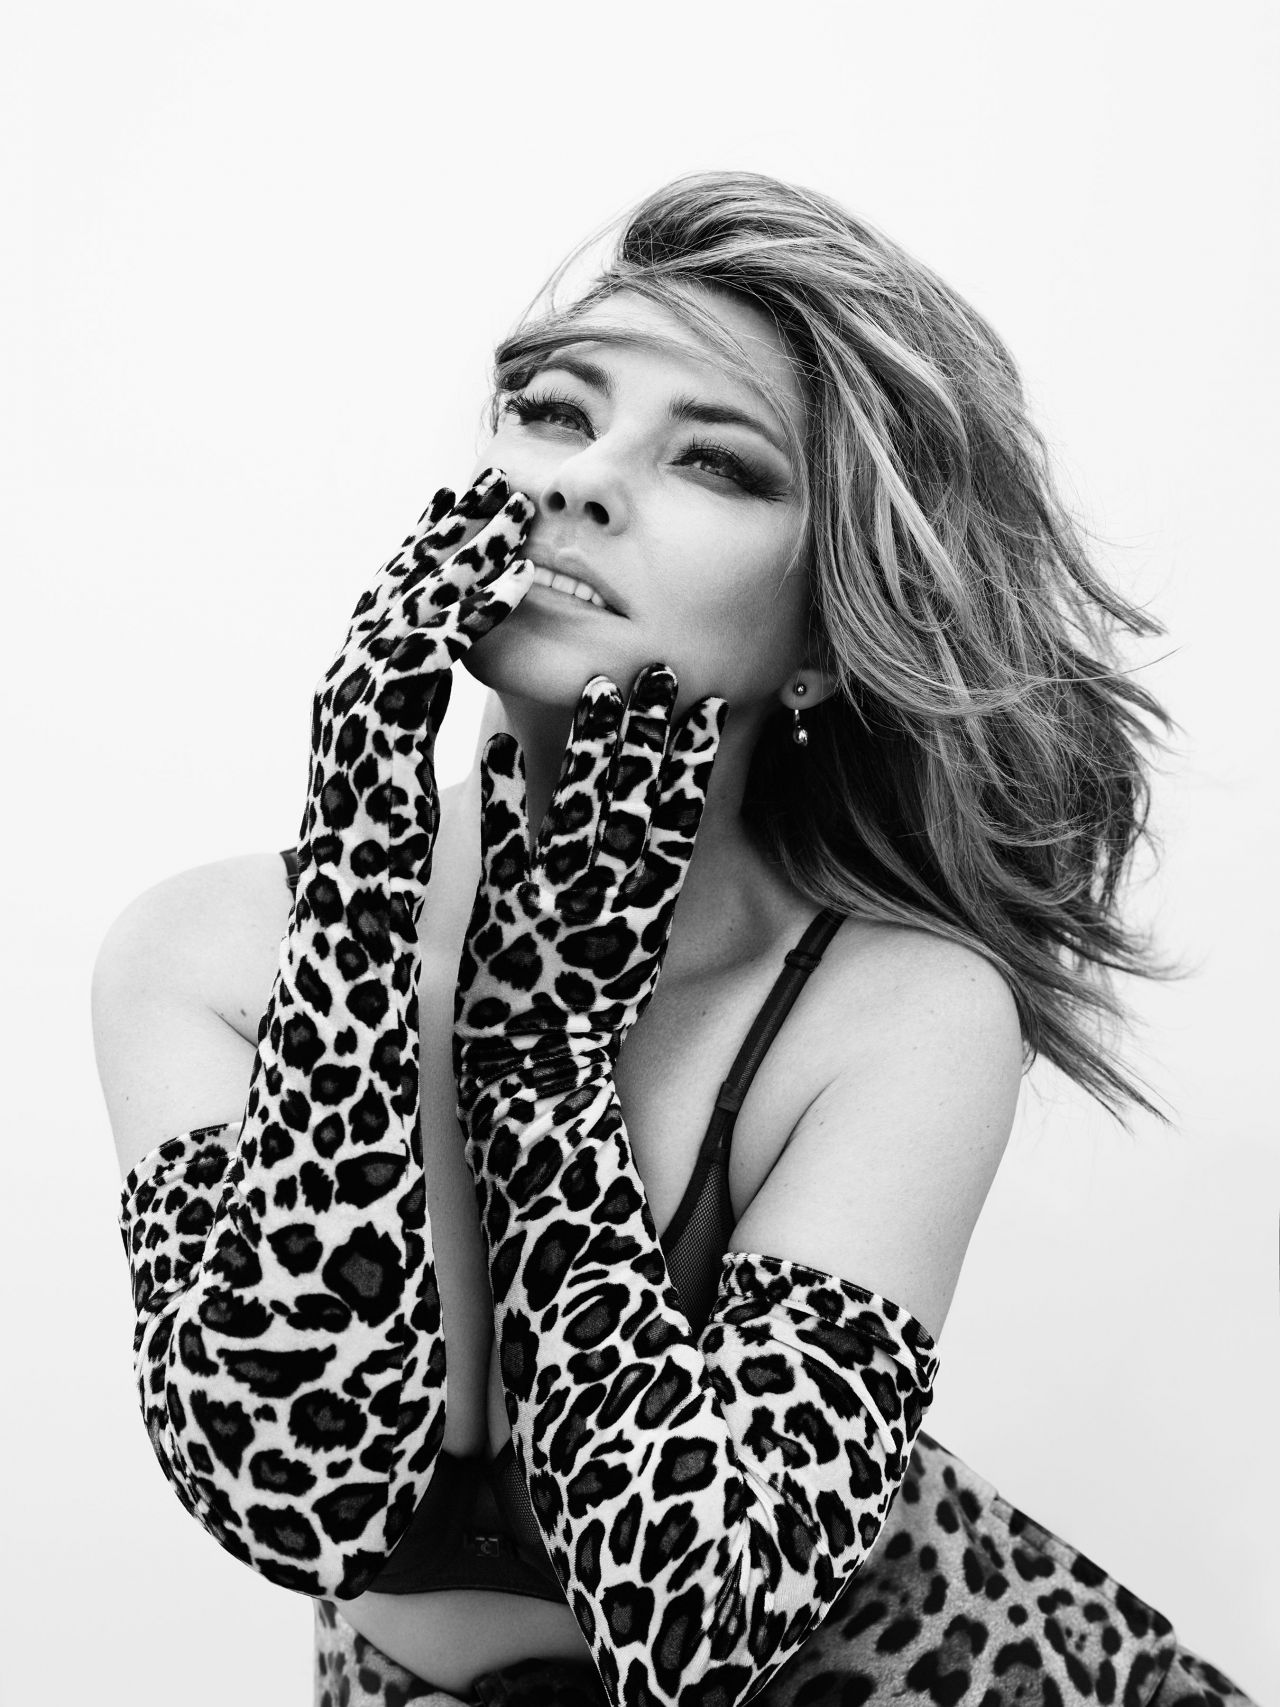 http://celebmafia.com/wp-content/uploads/2017/08/shania-twain-promotion-for-her-new-cd-now-2017-2.jpg